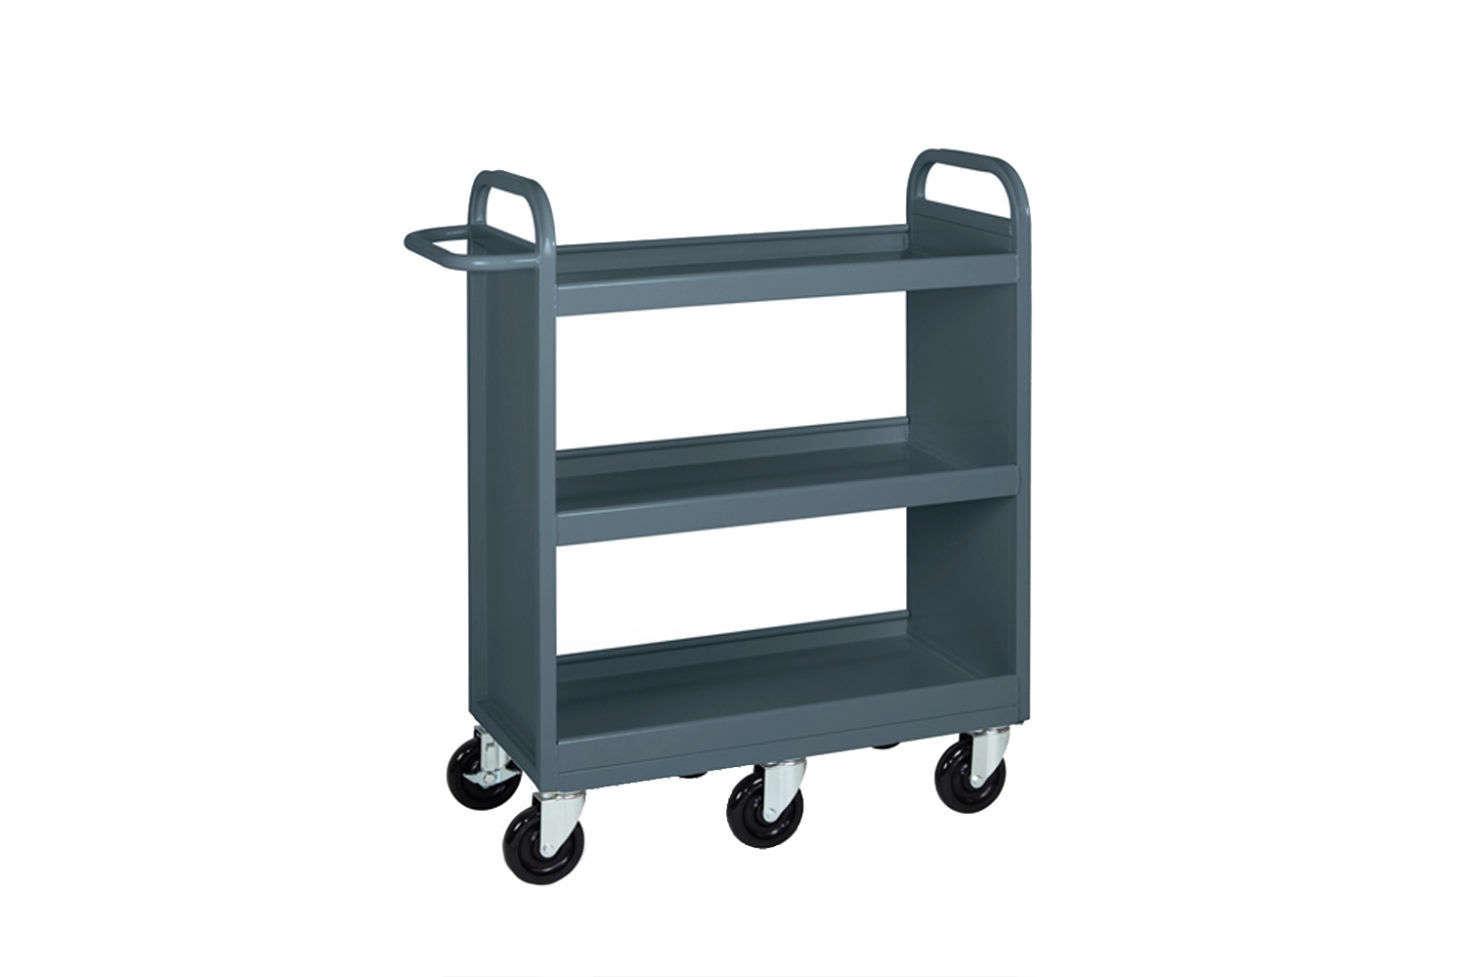 Sandusky Cabinets Tray Shelf Utility Truck